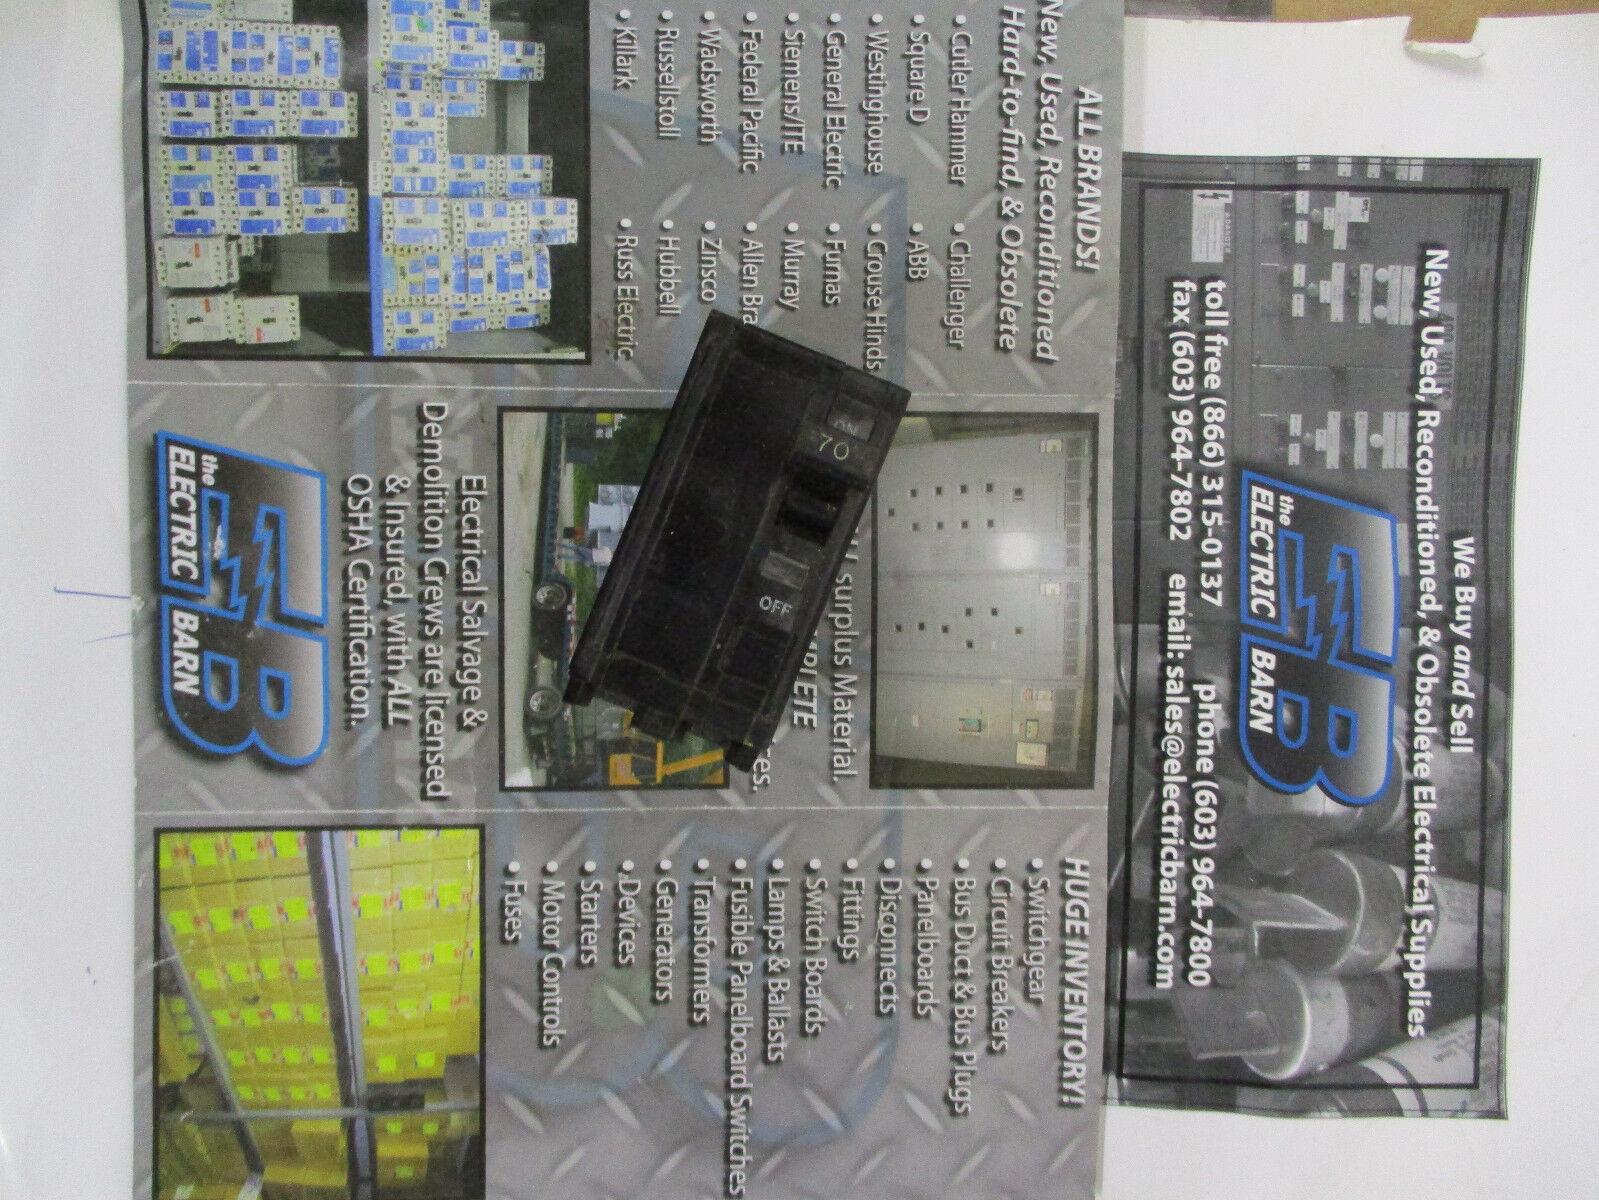 Square D Type Qo 2 Pole 70a 70 Amp Circuit Breaker Guaranteed YW QO270 |  eBay